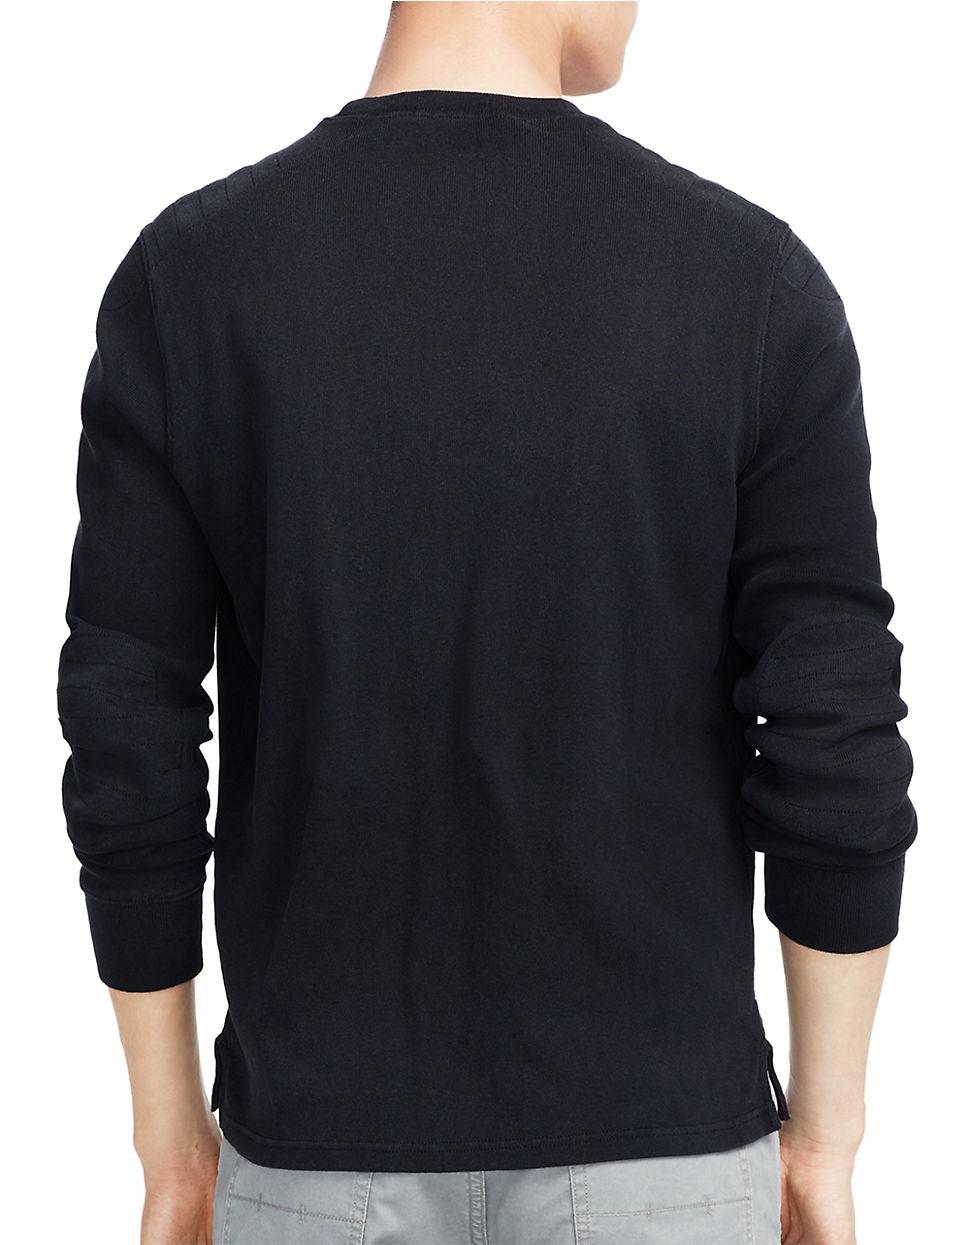 polo ralph lauren bulldog jersey pullover in black for men lyst. Black Bedroom Furniture Sets. Home Design Ideas